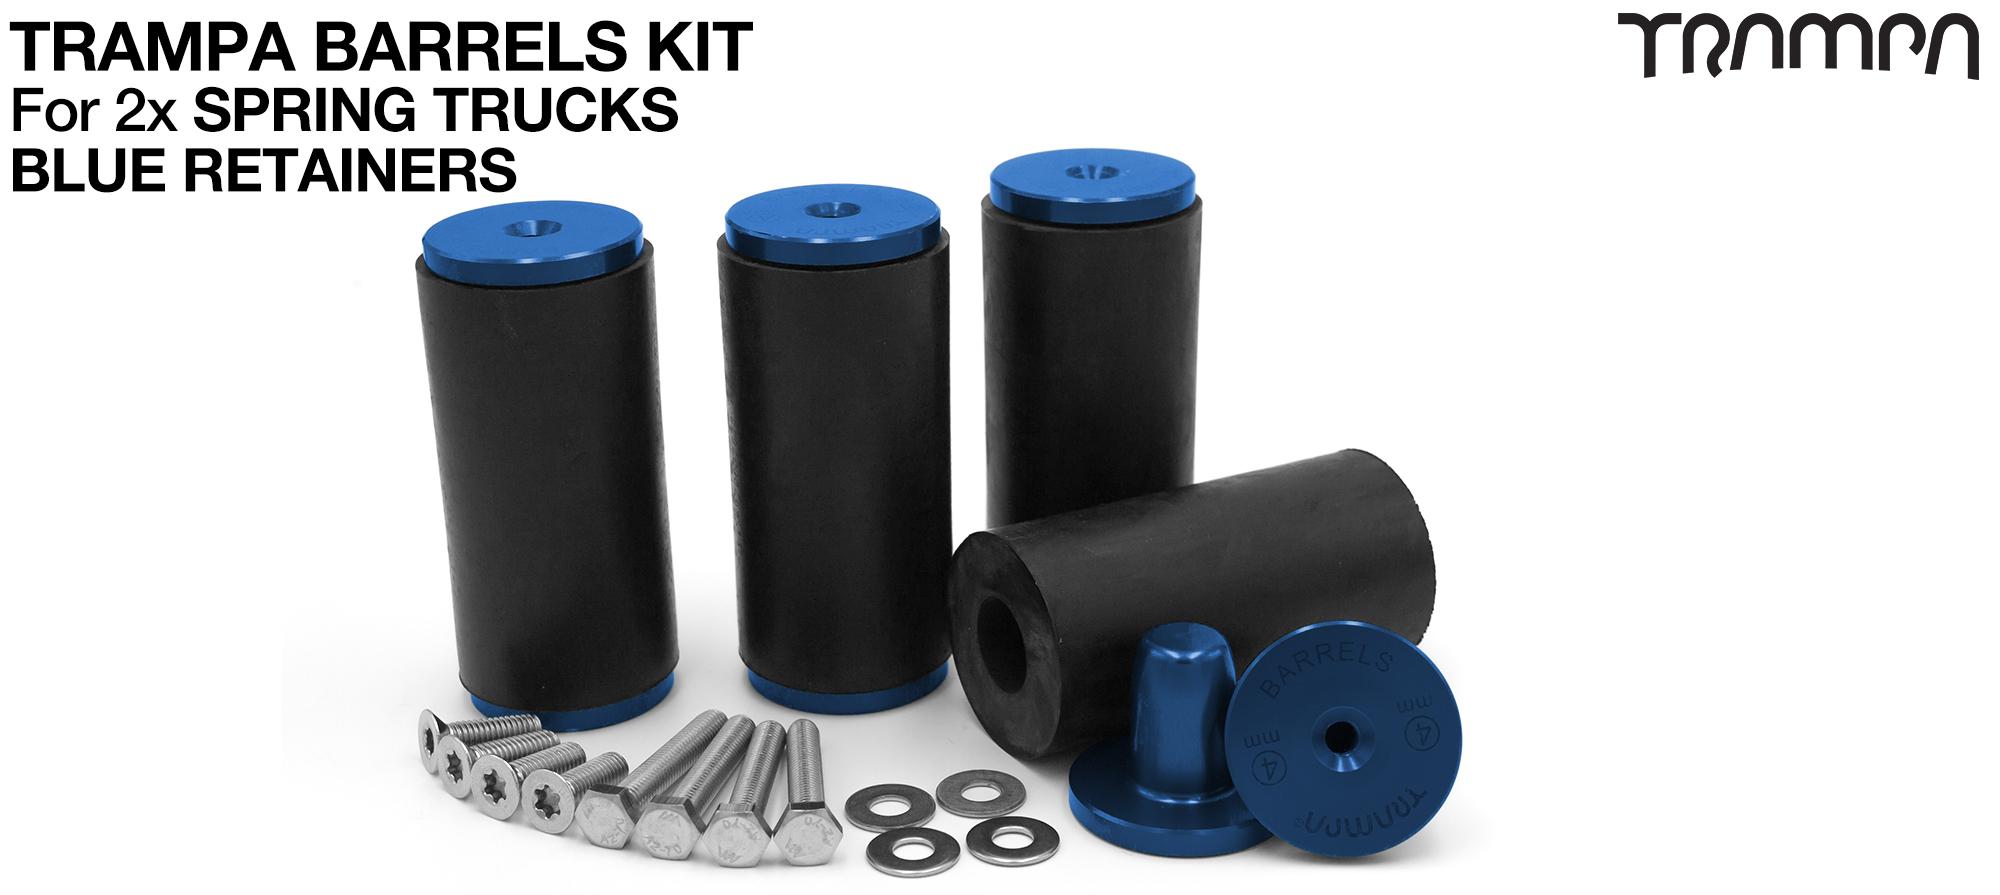 TRAMPA BARRELS Complete DECK Kit - BLUE